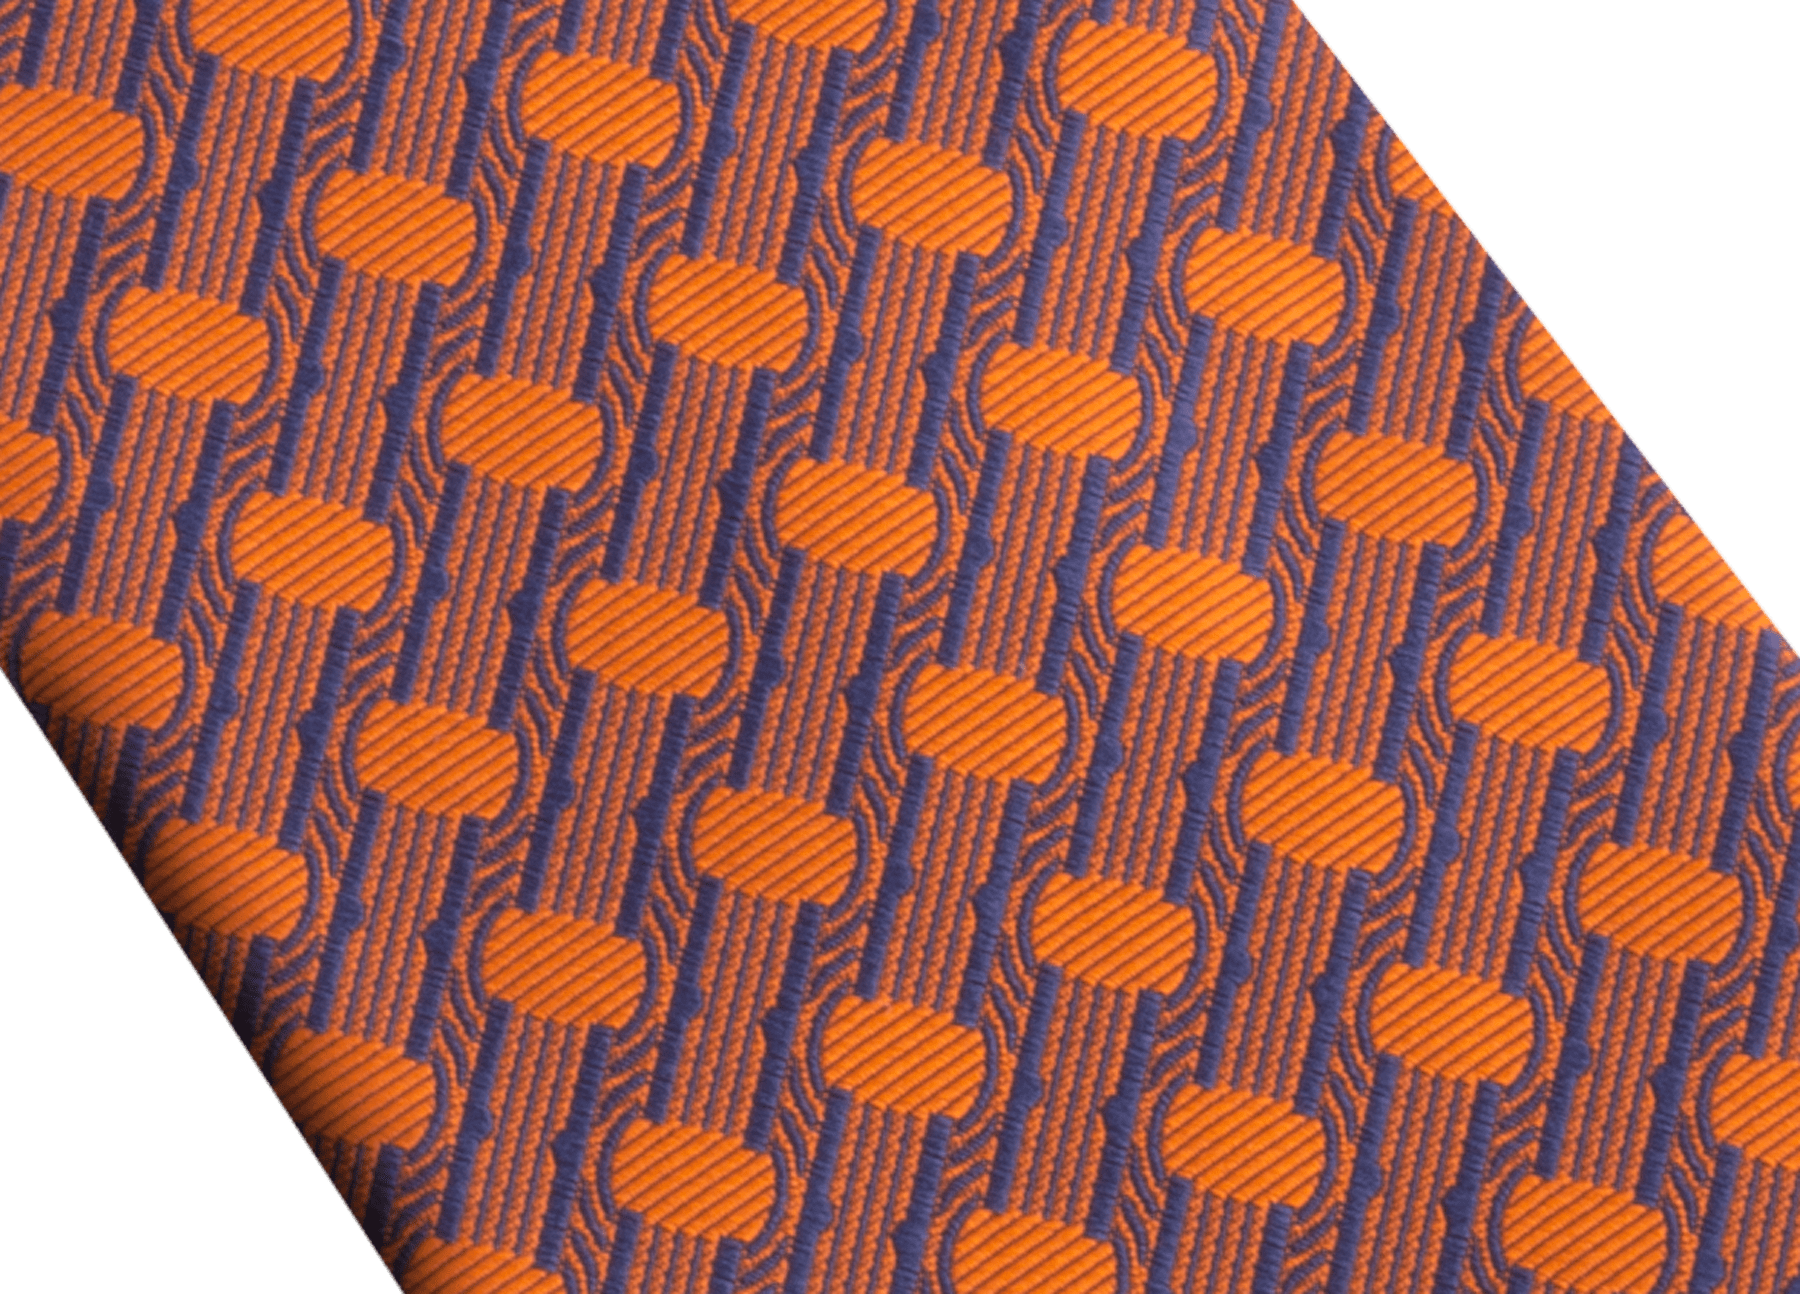 Saffron B.zero1 pattern seven-folds tie in fine silk. 243683 image 4